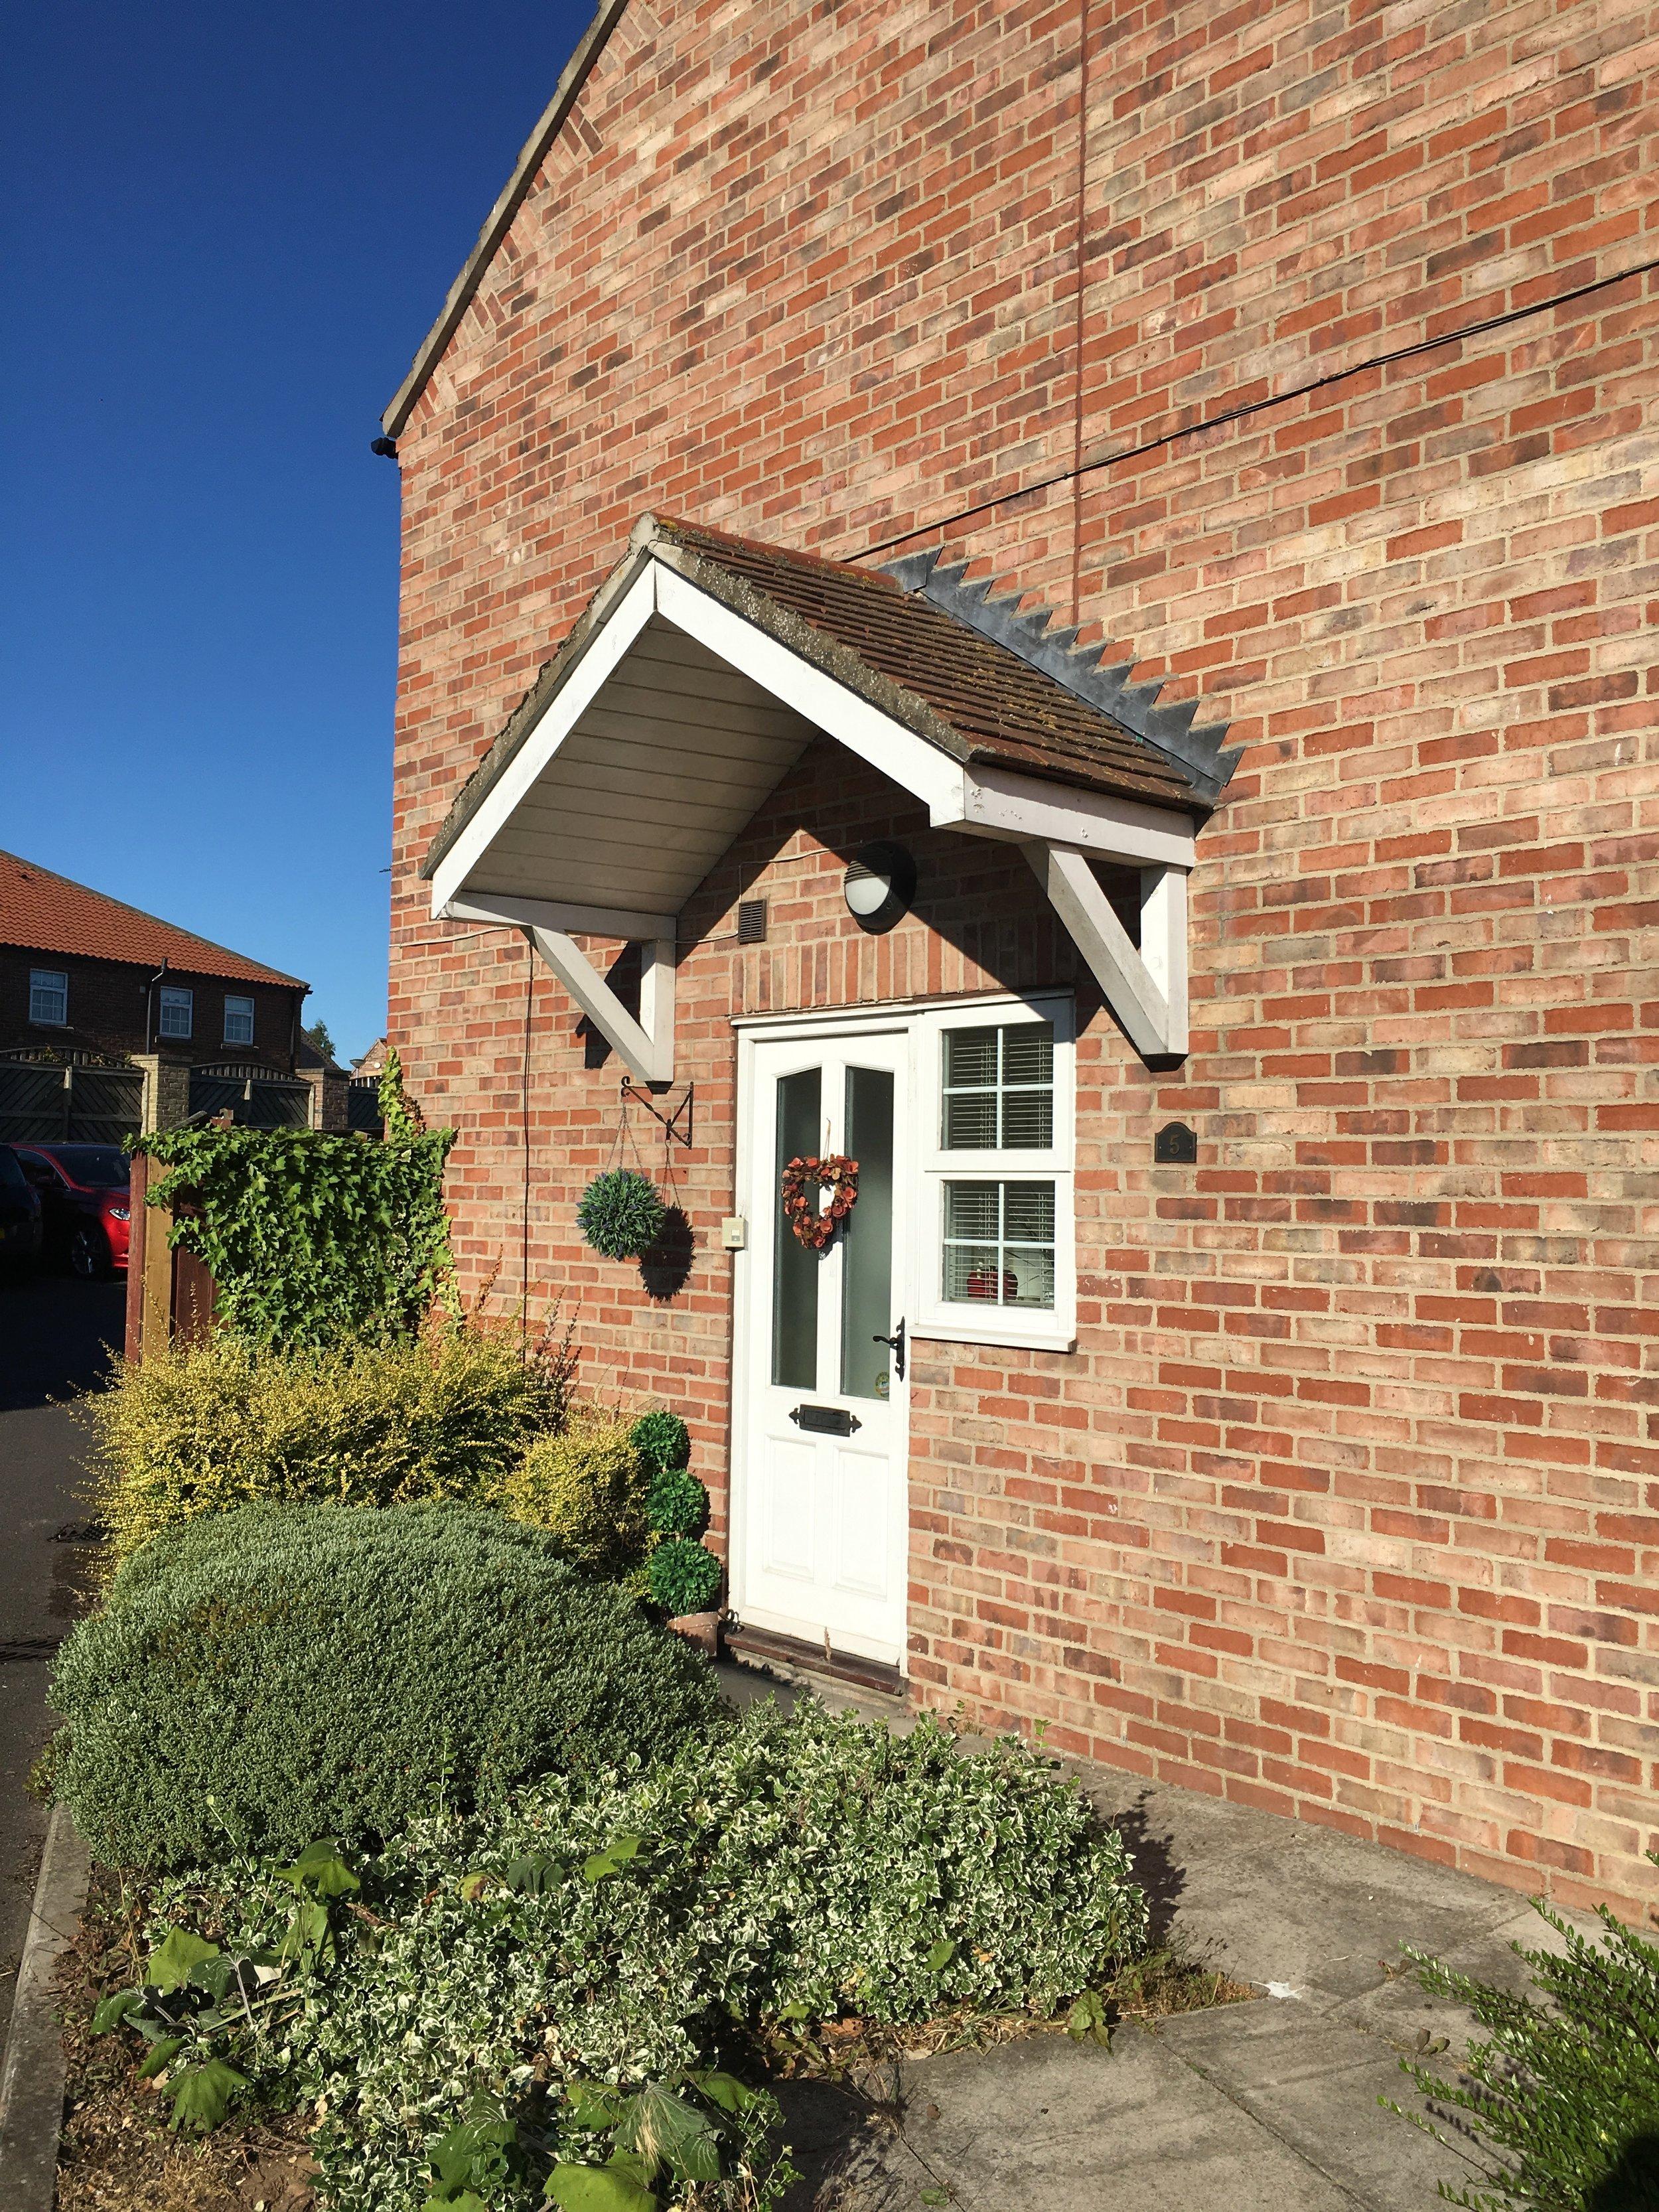 Orchard Mews Doorway 1 - Samuel Kendall Associates - Driffield Architects